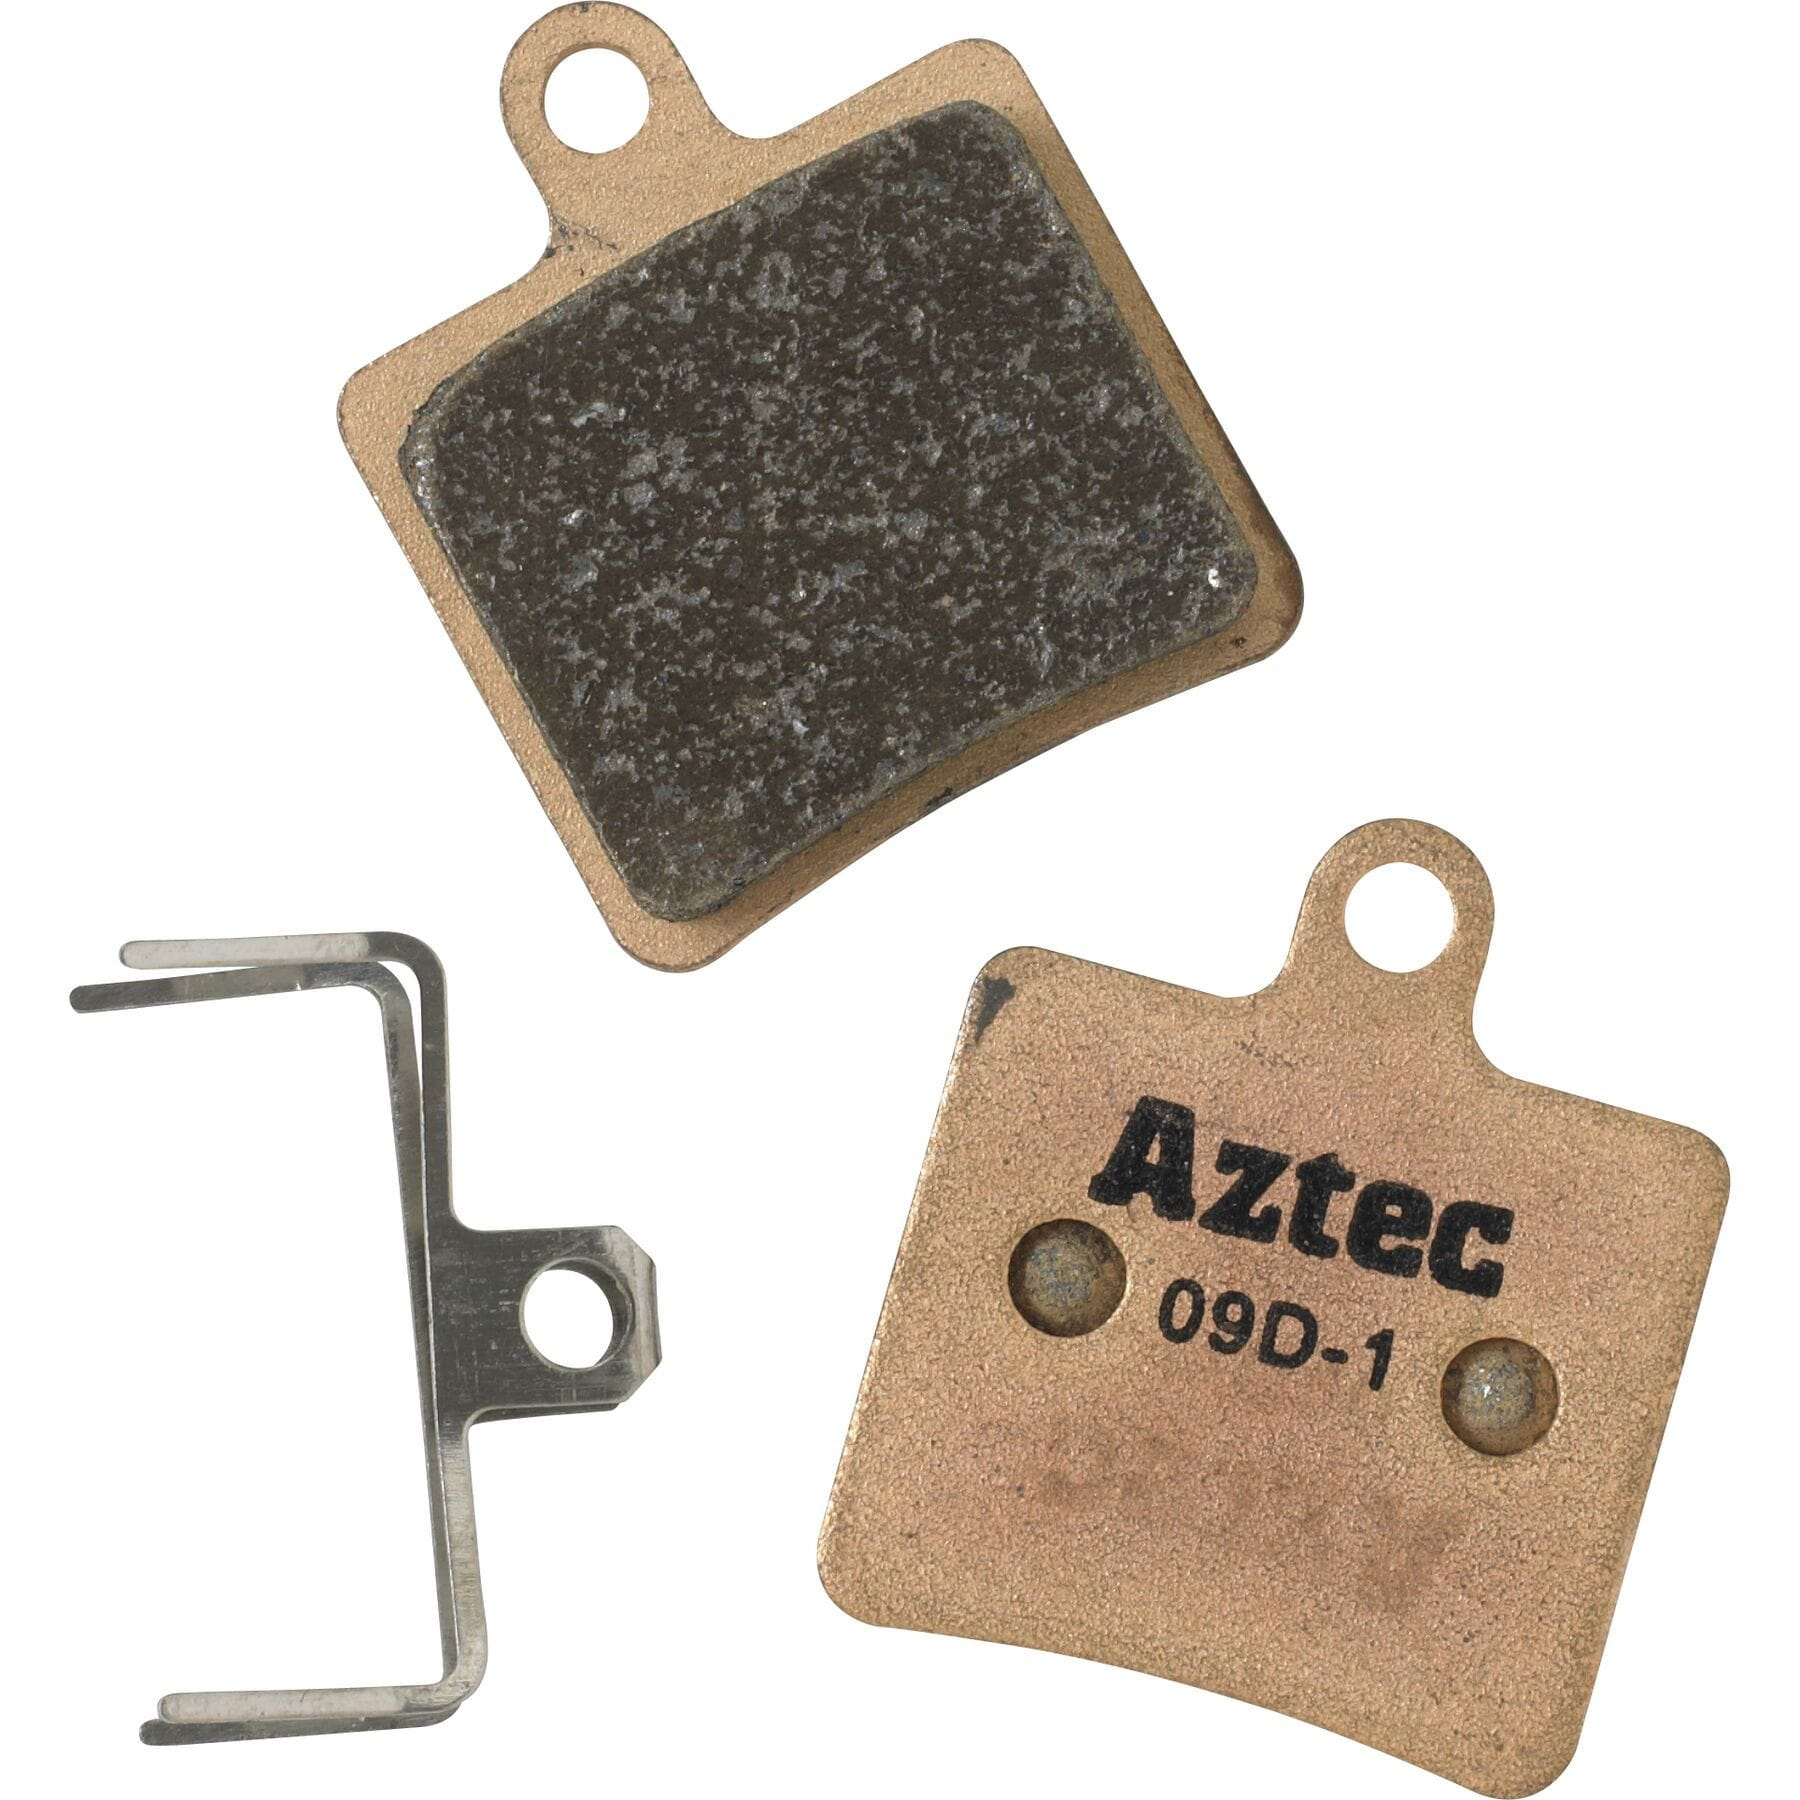 Aztec Sintered disc brake pads for Hope Mini